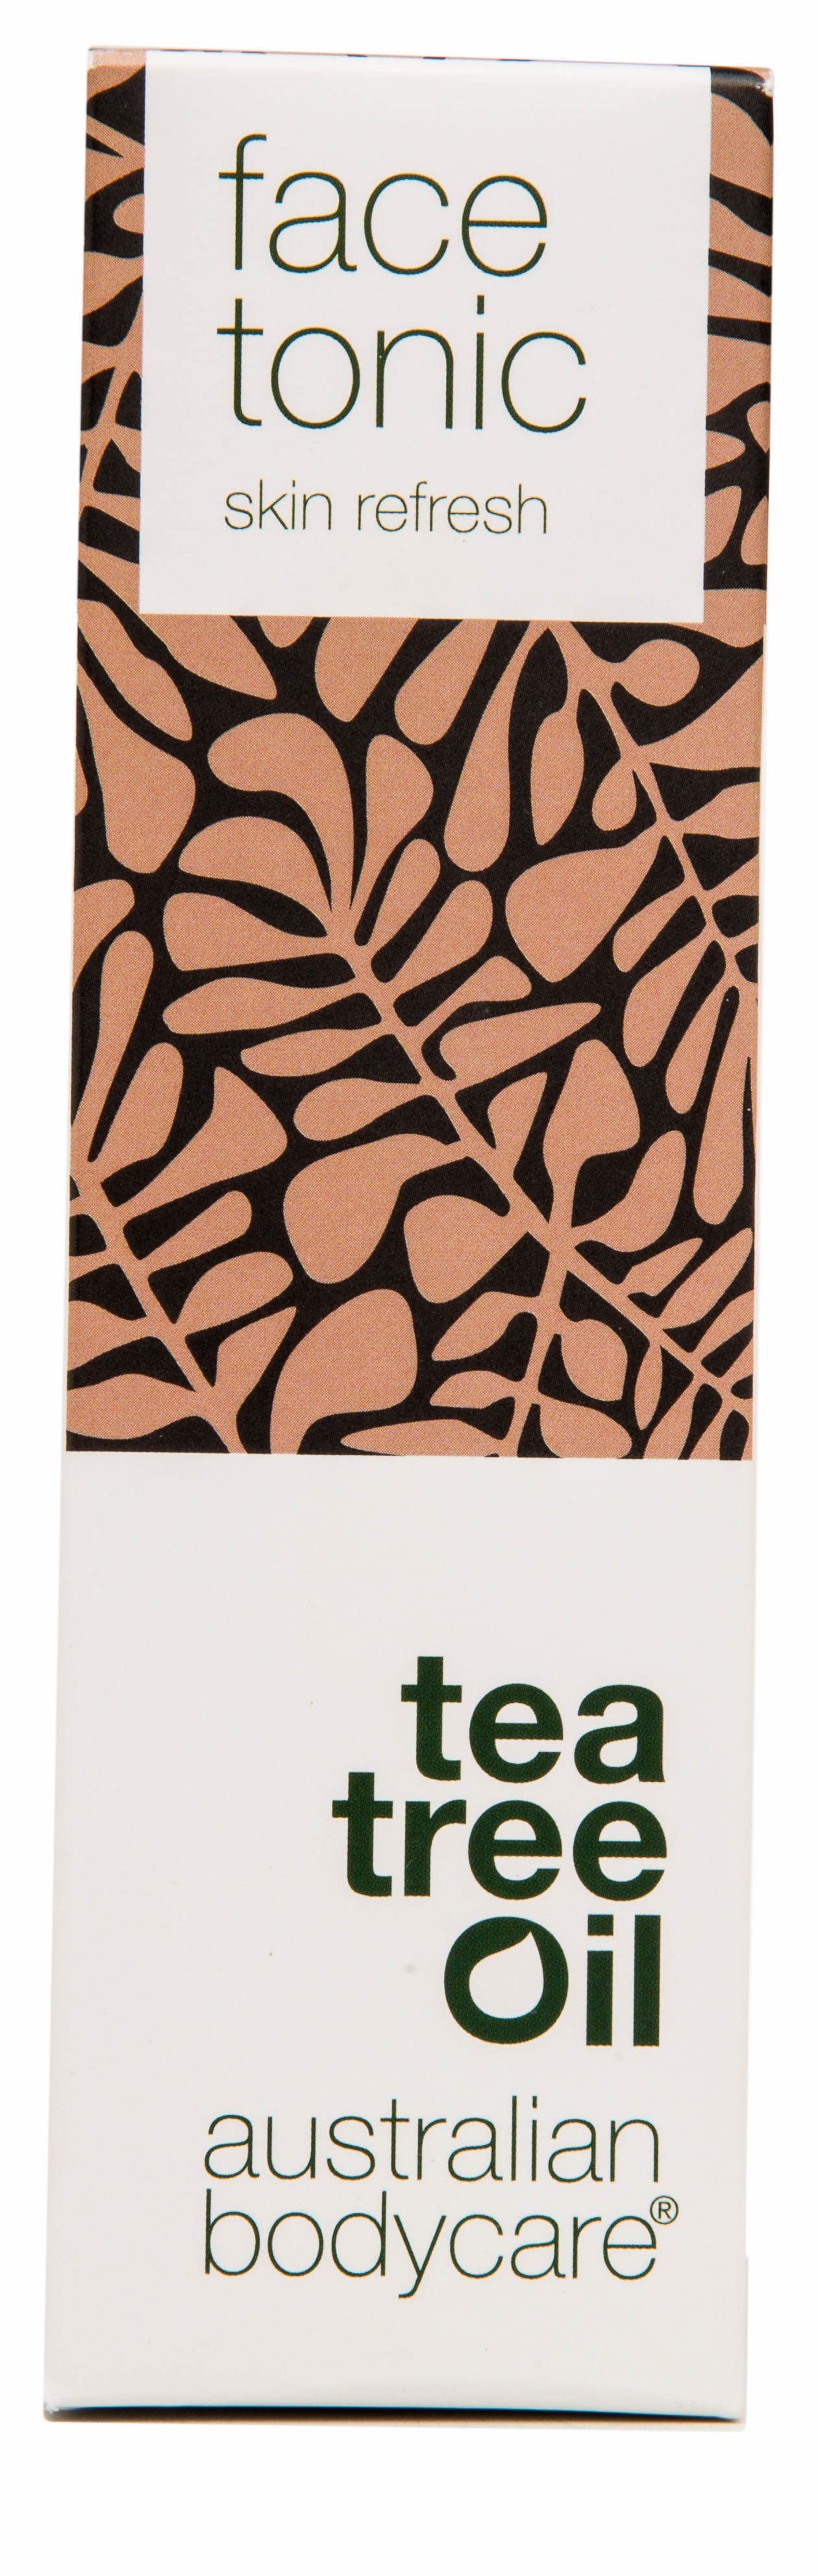 Billede af Australian Bodycare Face Tonic - 150 ml